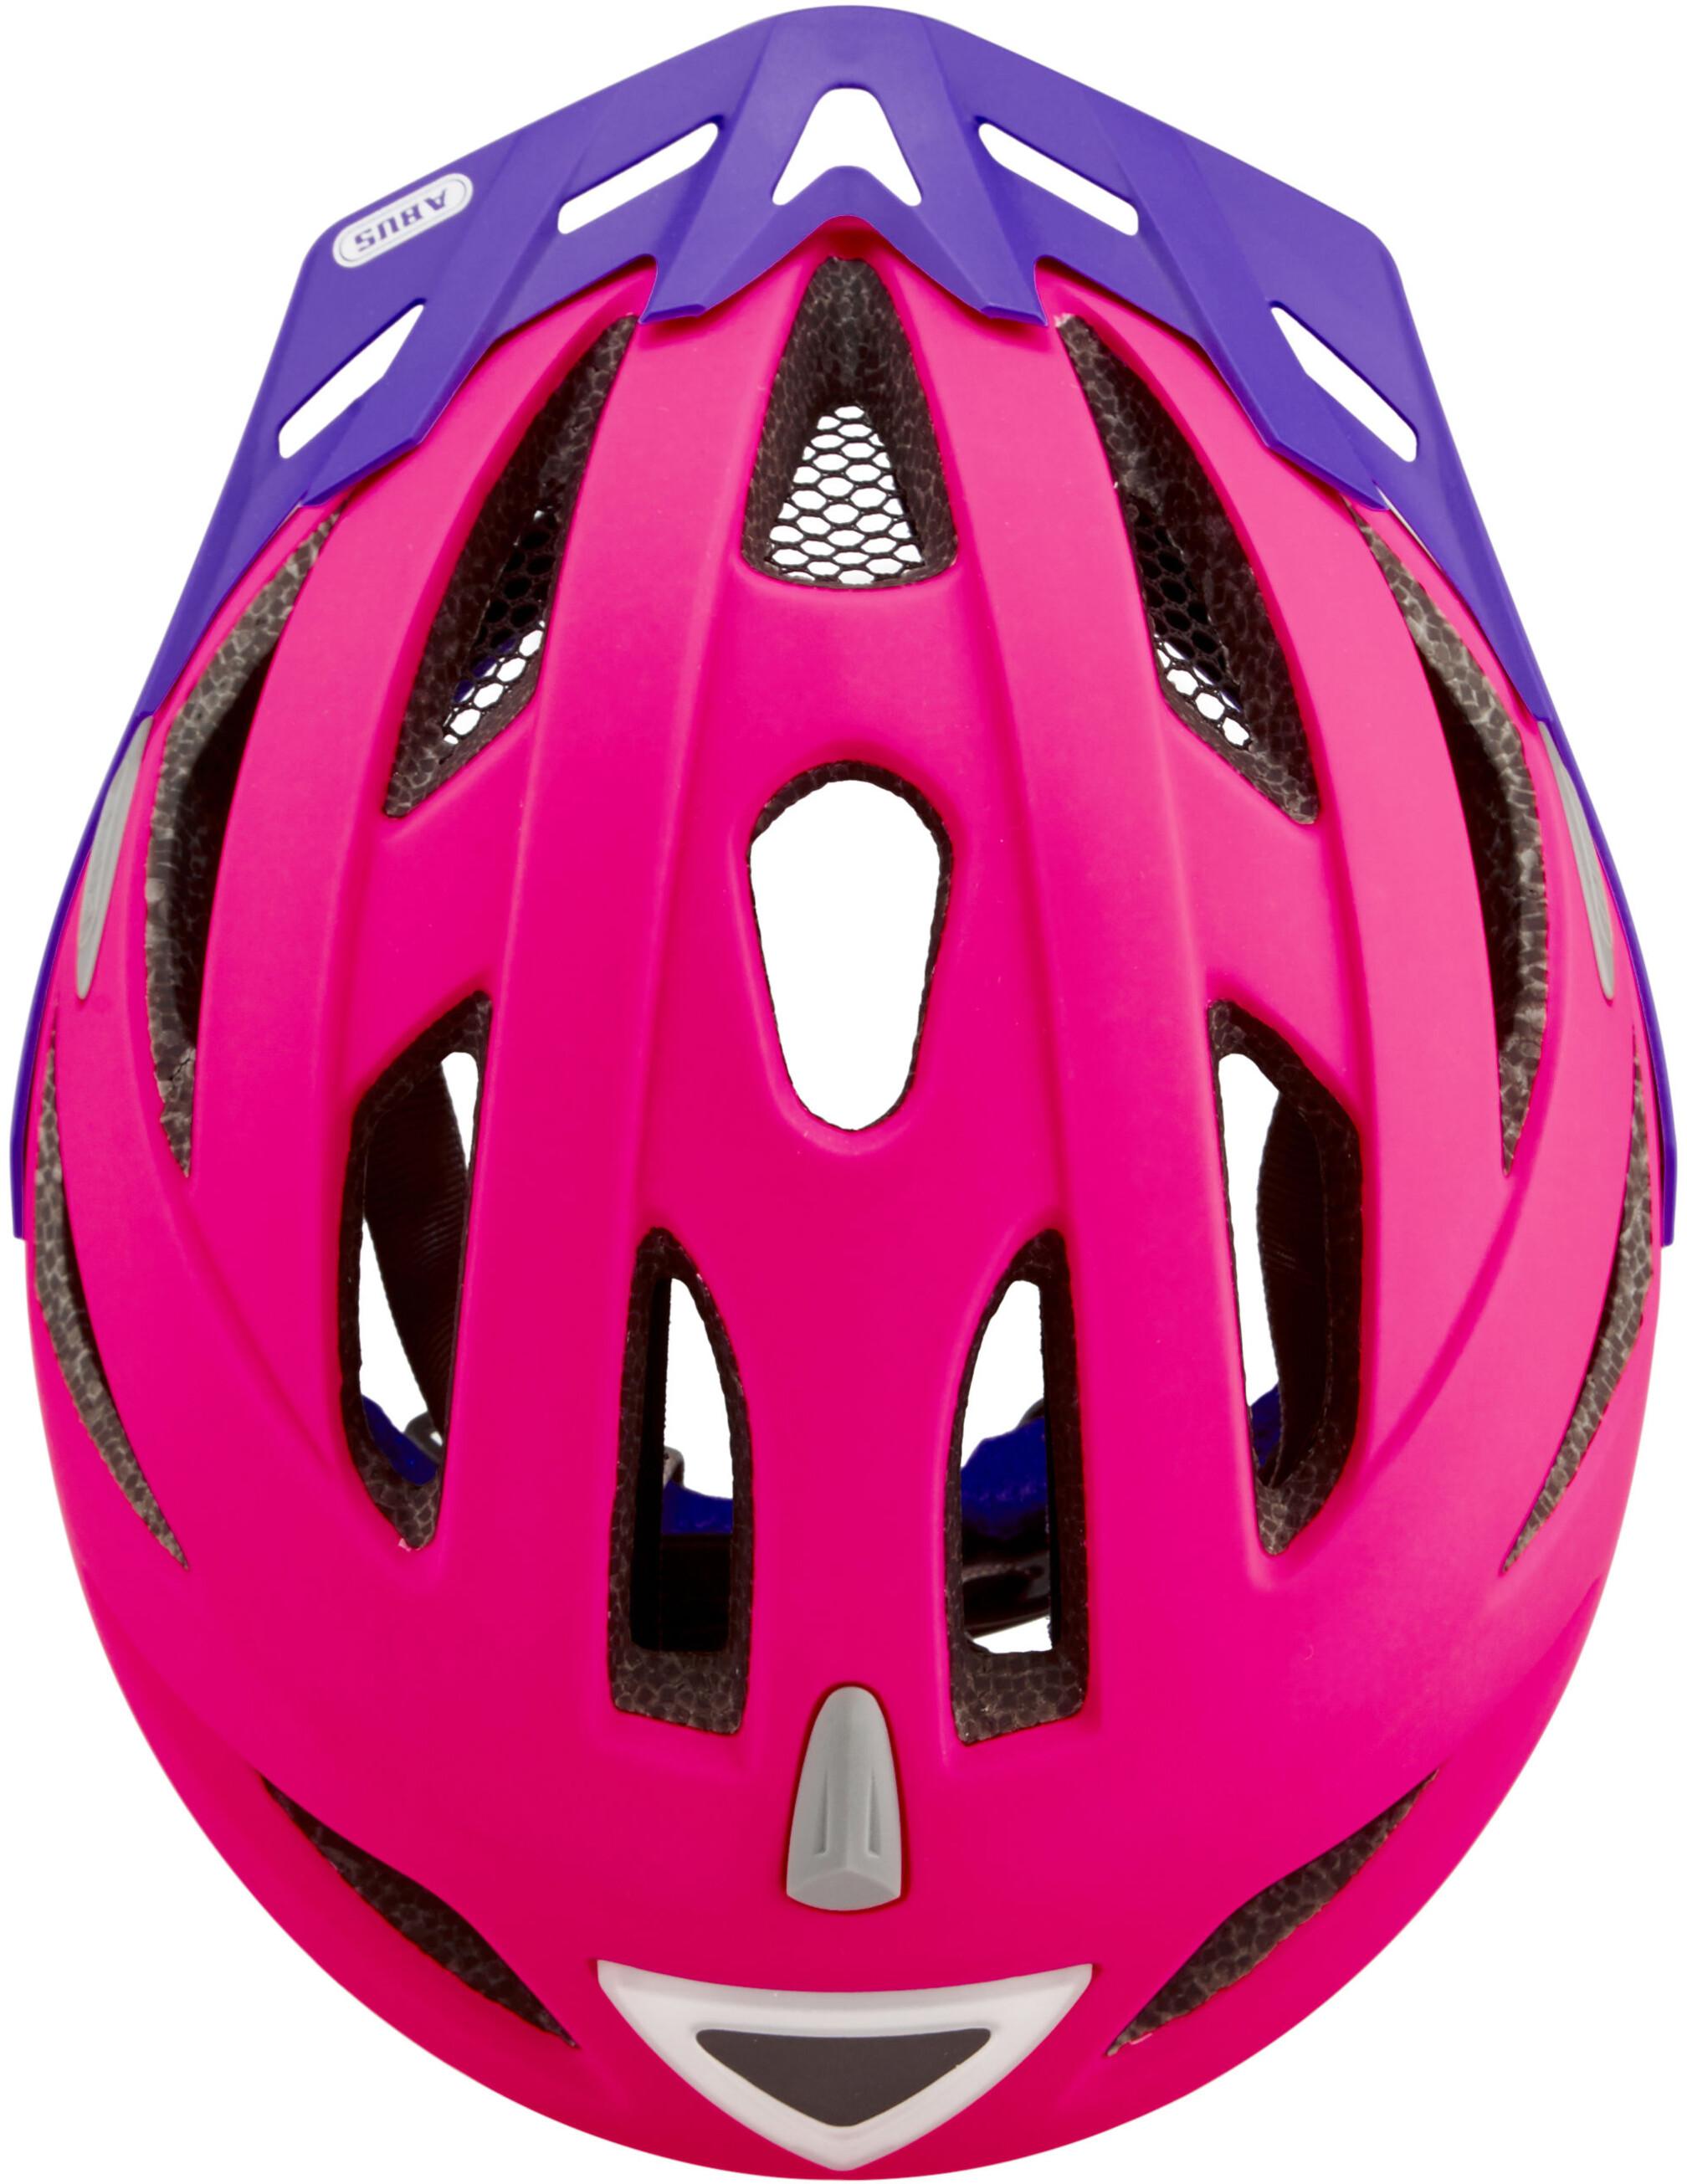 abus urban i 2 0 casco de bicicleta rosa. Black Bedroom Furniture Sets. Home Design Ideas